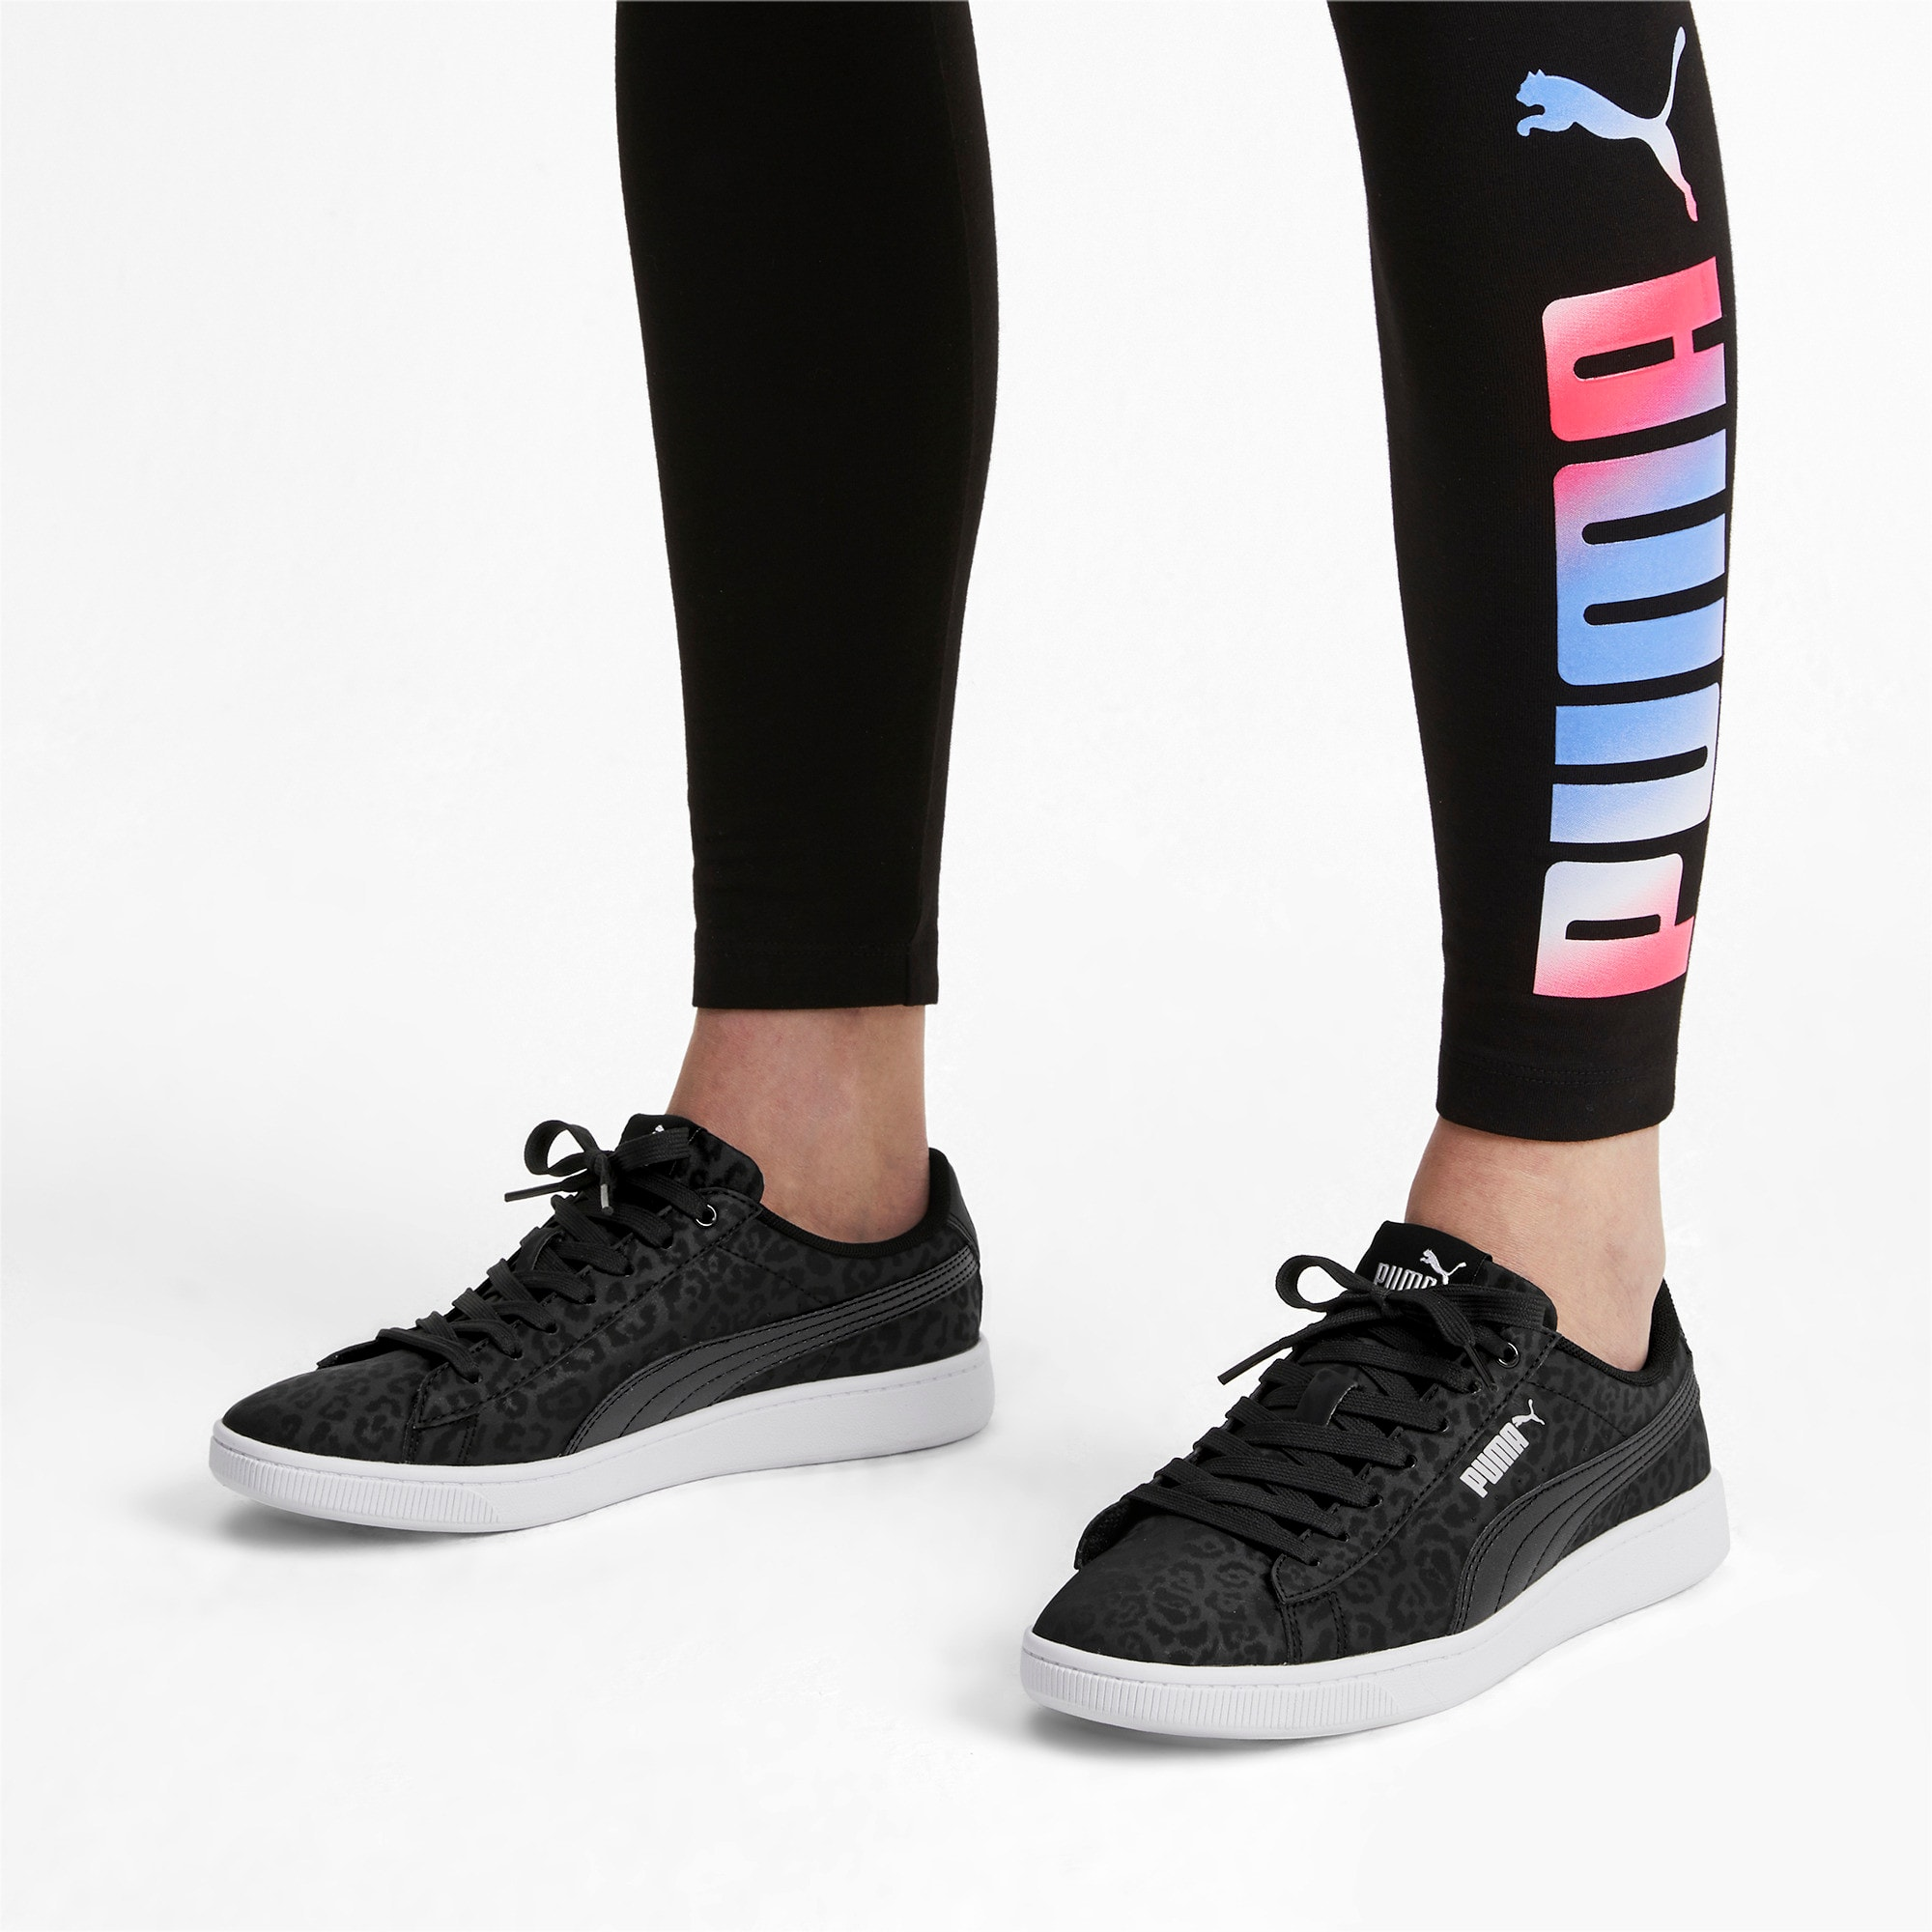 Thumbnail 2 of PUMA Vikky v2 Wildcat Women's Sneakers, Puma Black-Puma Silver-White, medium